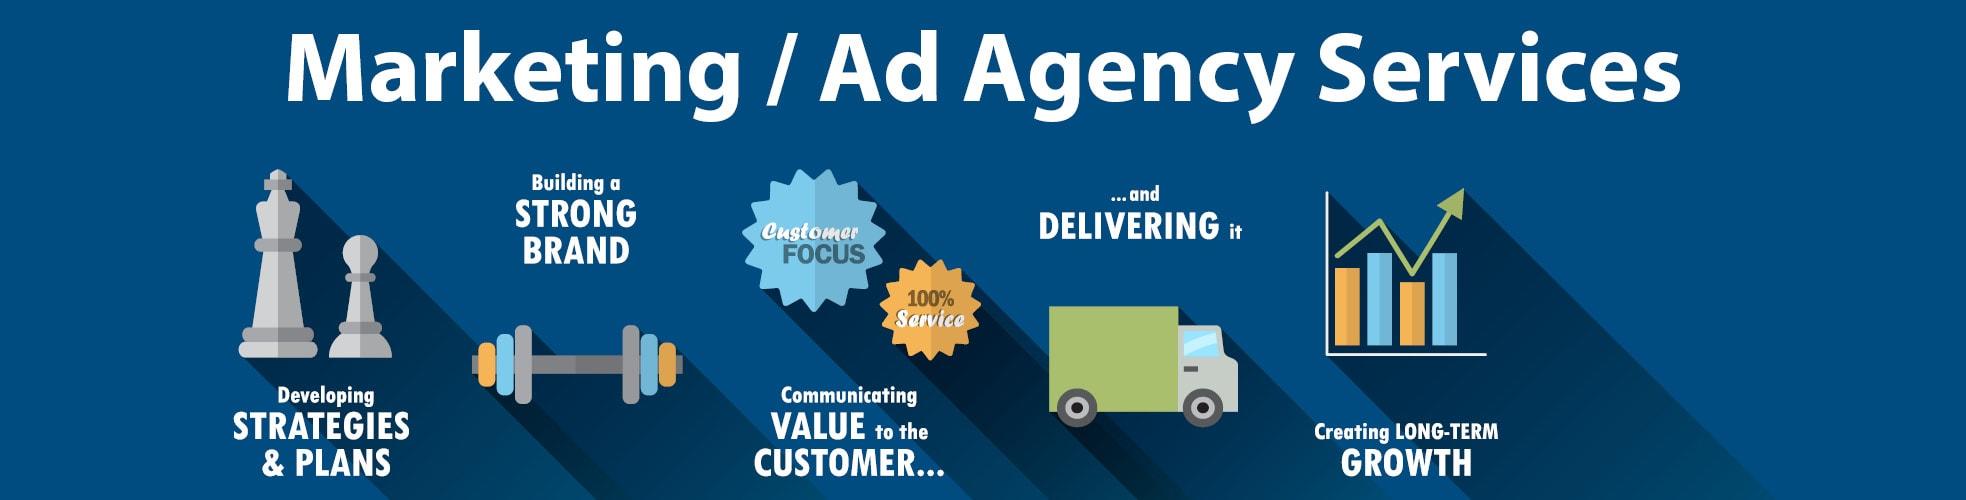 Marketing Agency Services MI